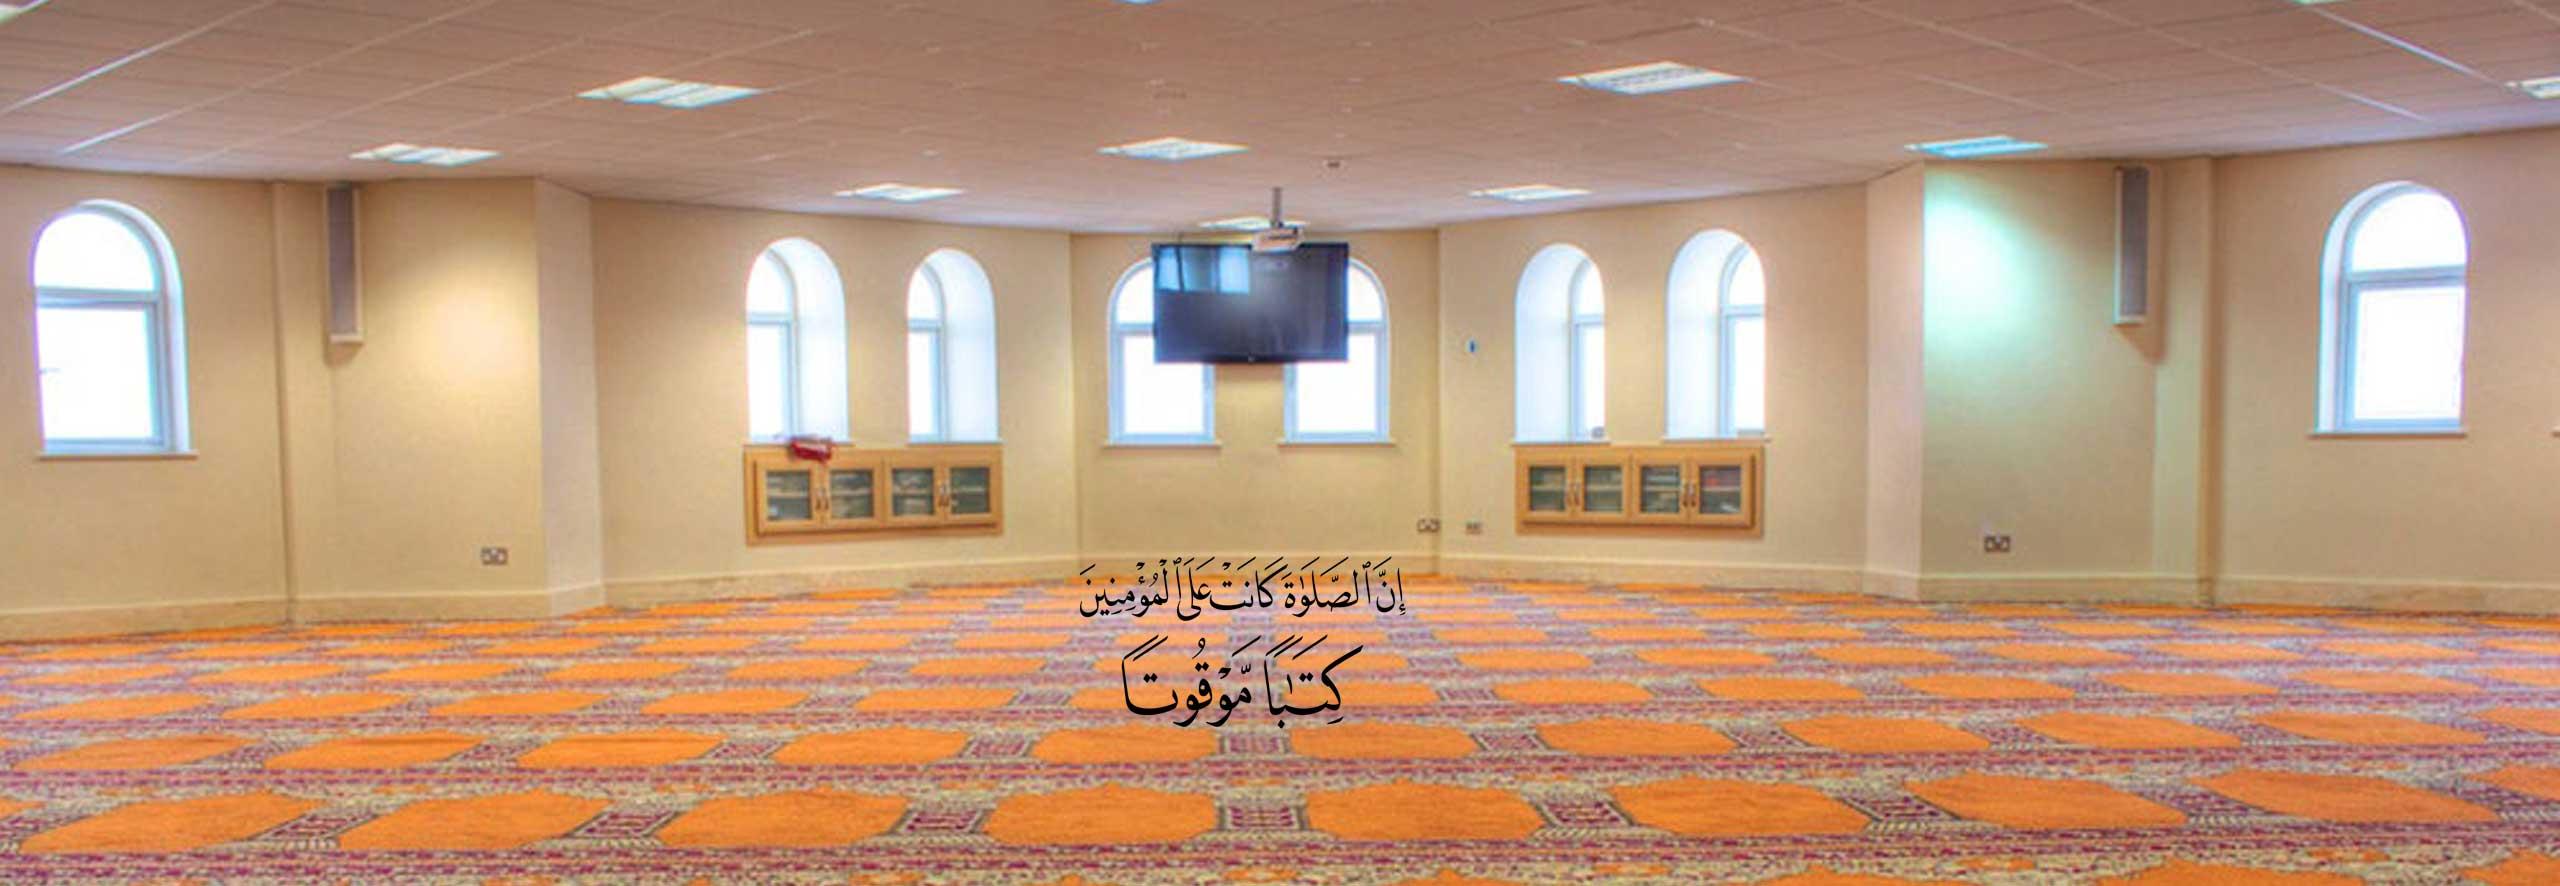 Prayer Timetable Liverpool Muslim Society